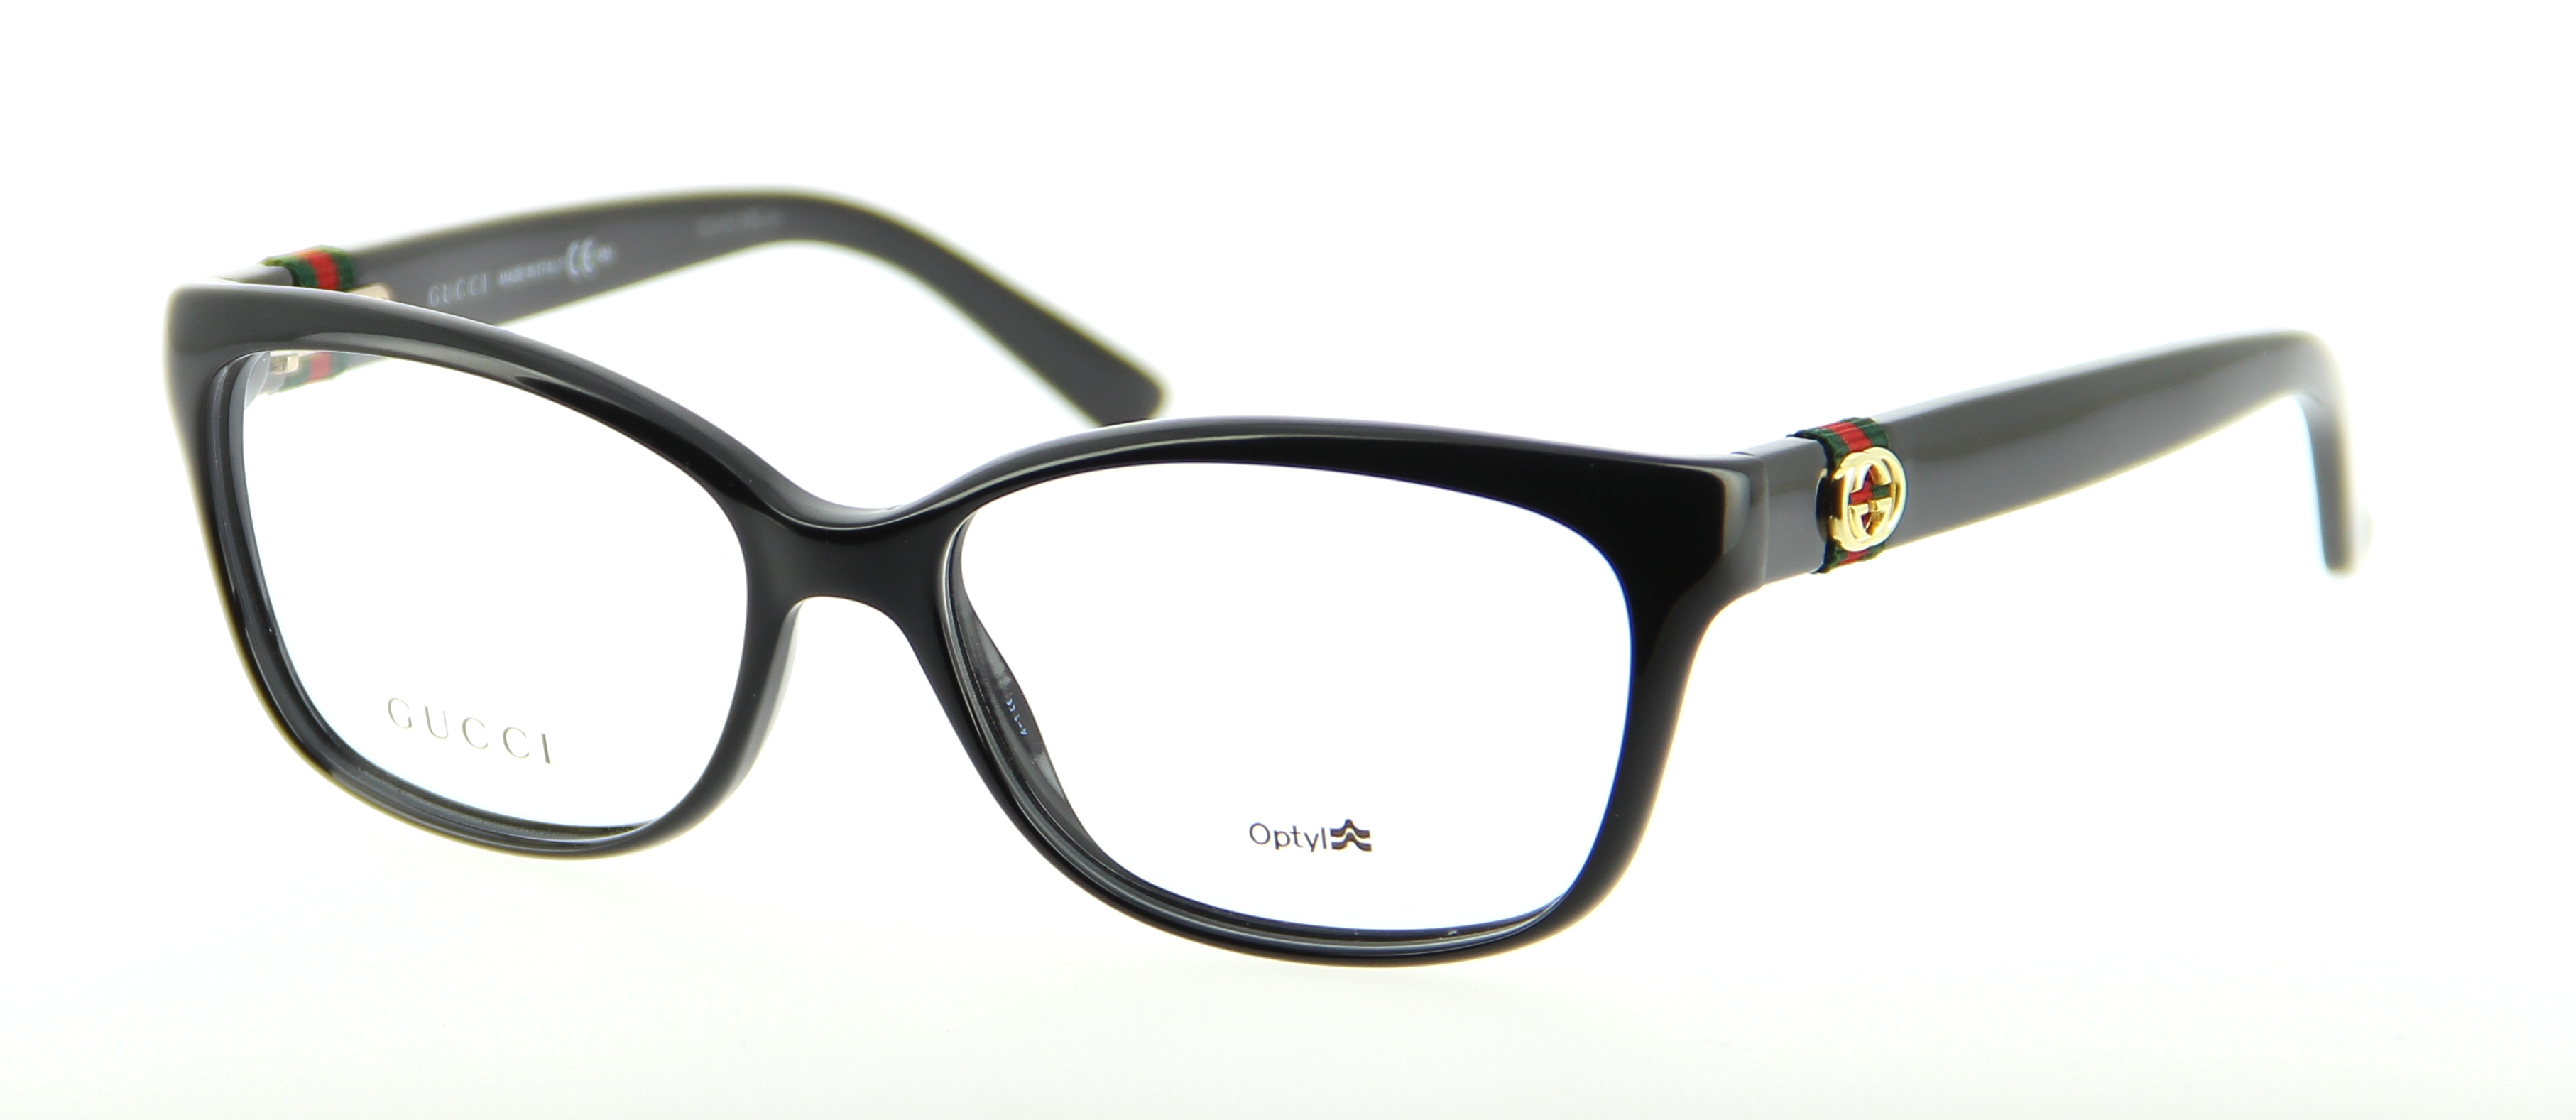 Eyeglasses GUCCI GG 3683 D28 53/15 Woman Noir Oval frames ...